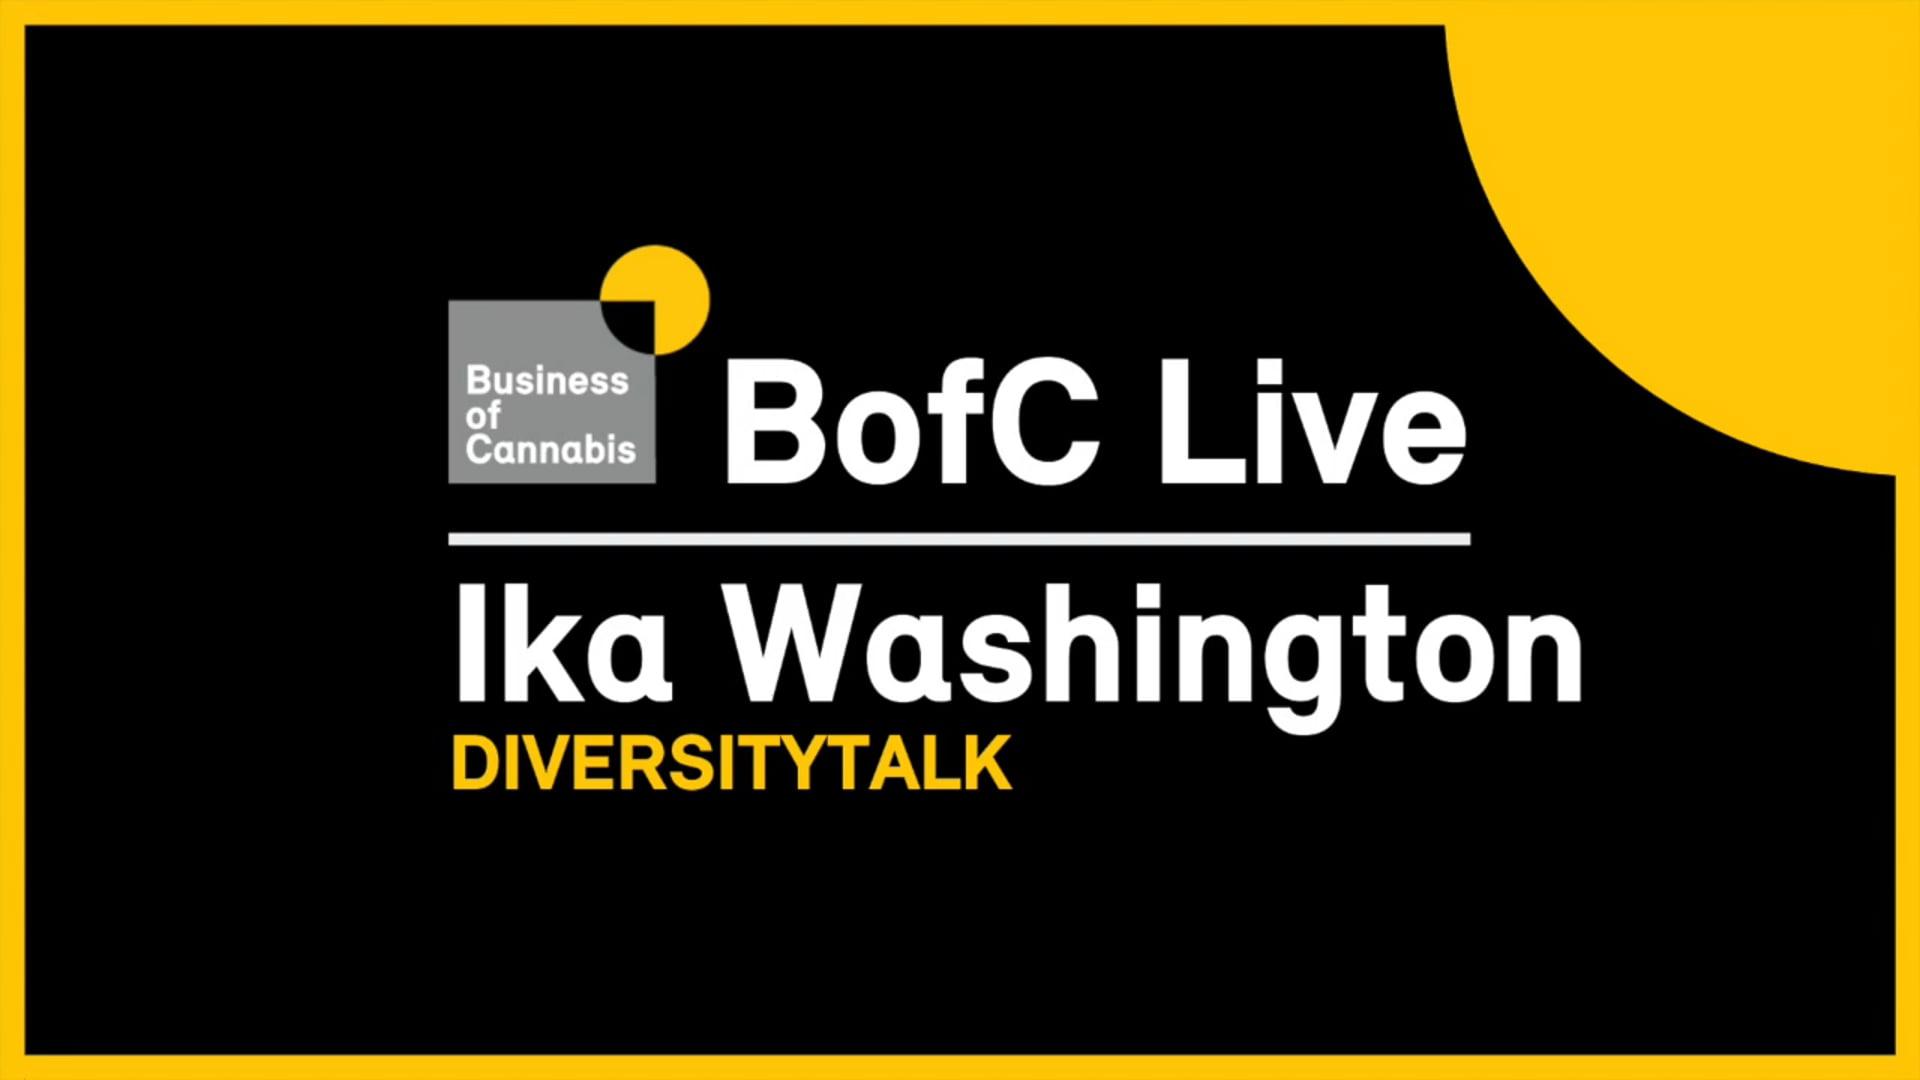 June 5, 2020 | BofC Live with Ika Washington, DiversityTalk  diversitytalk.world